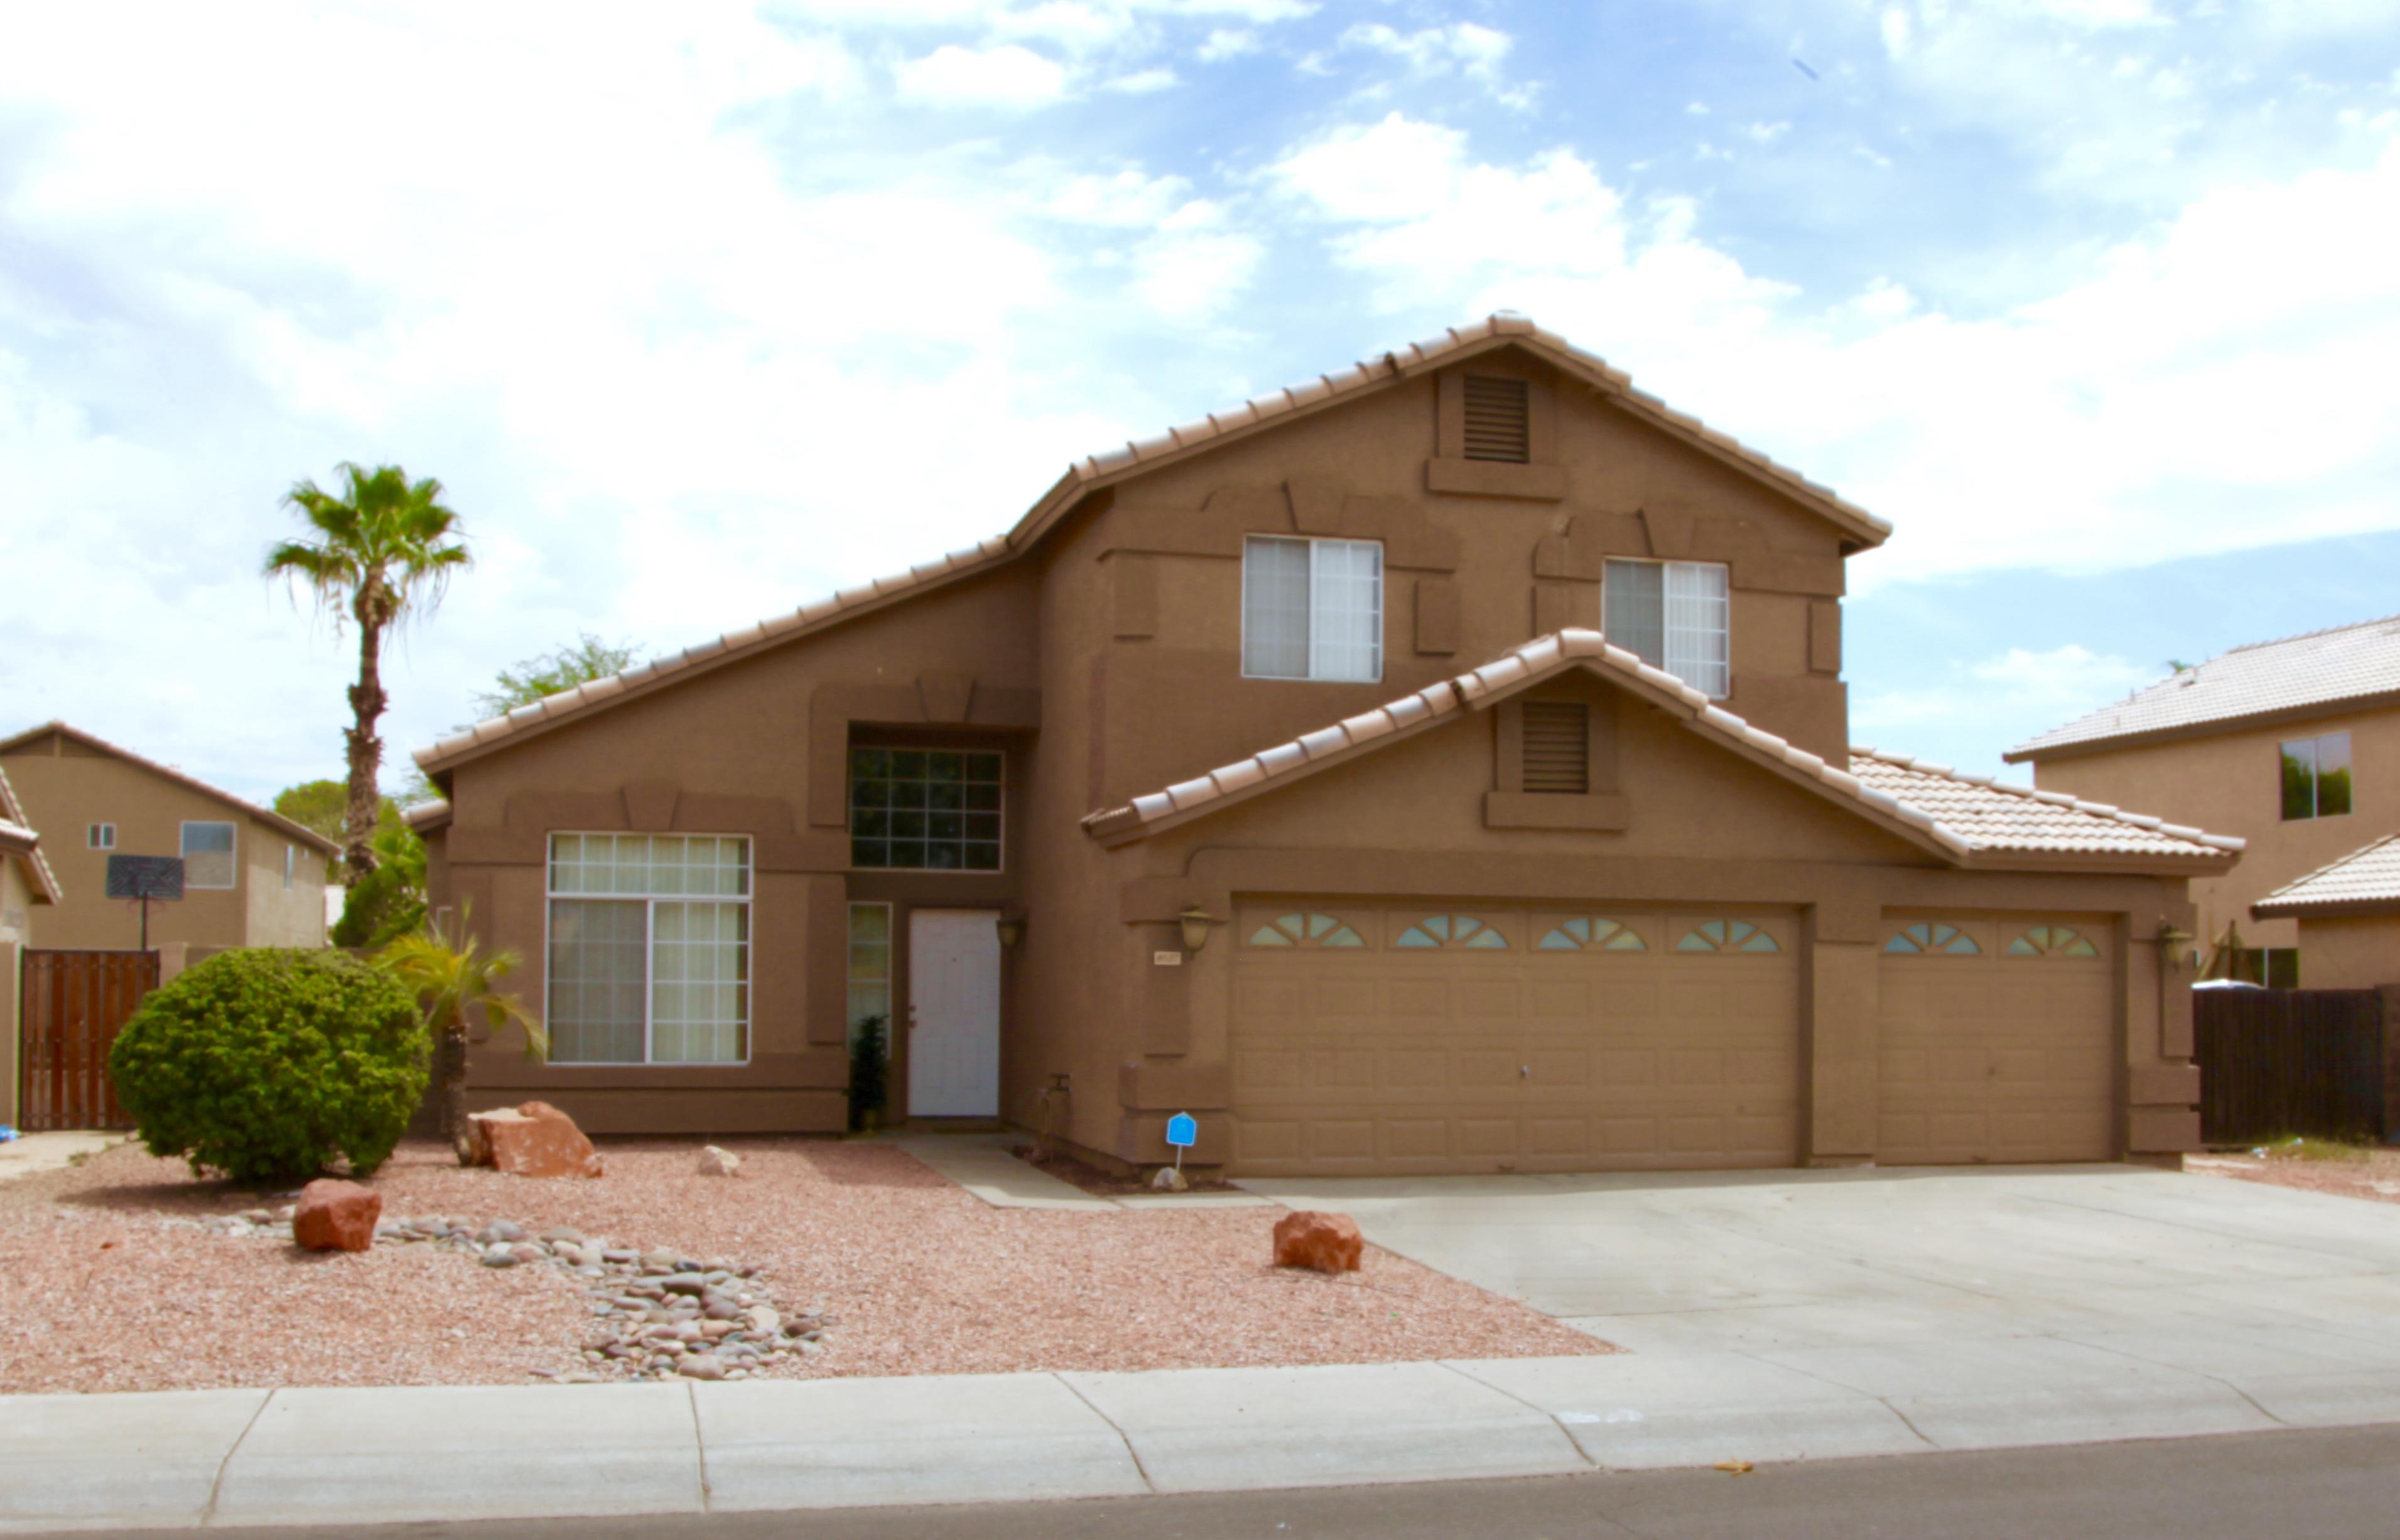 8537 W Wilshire Dr Phoenix, AZ 85037